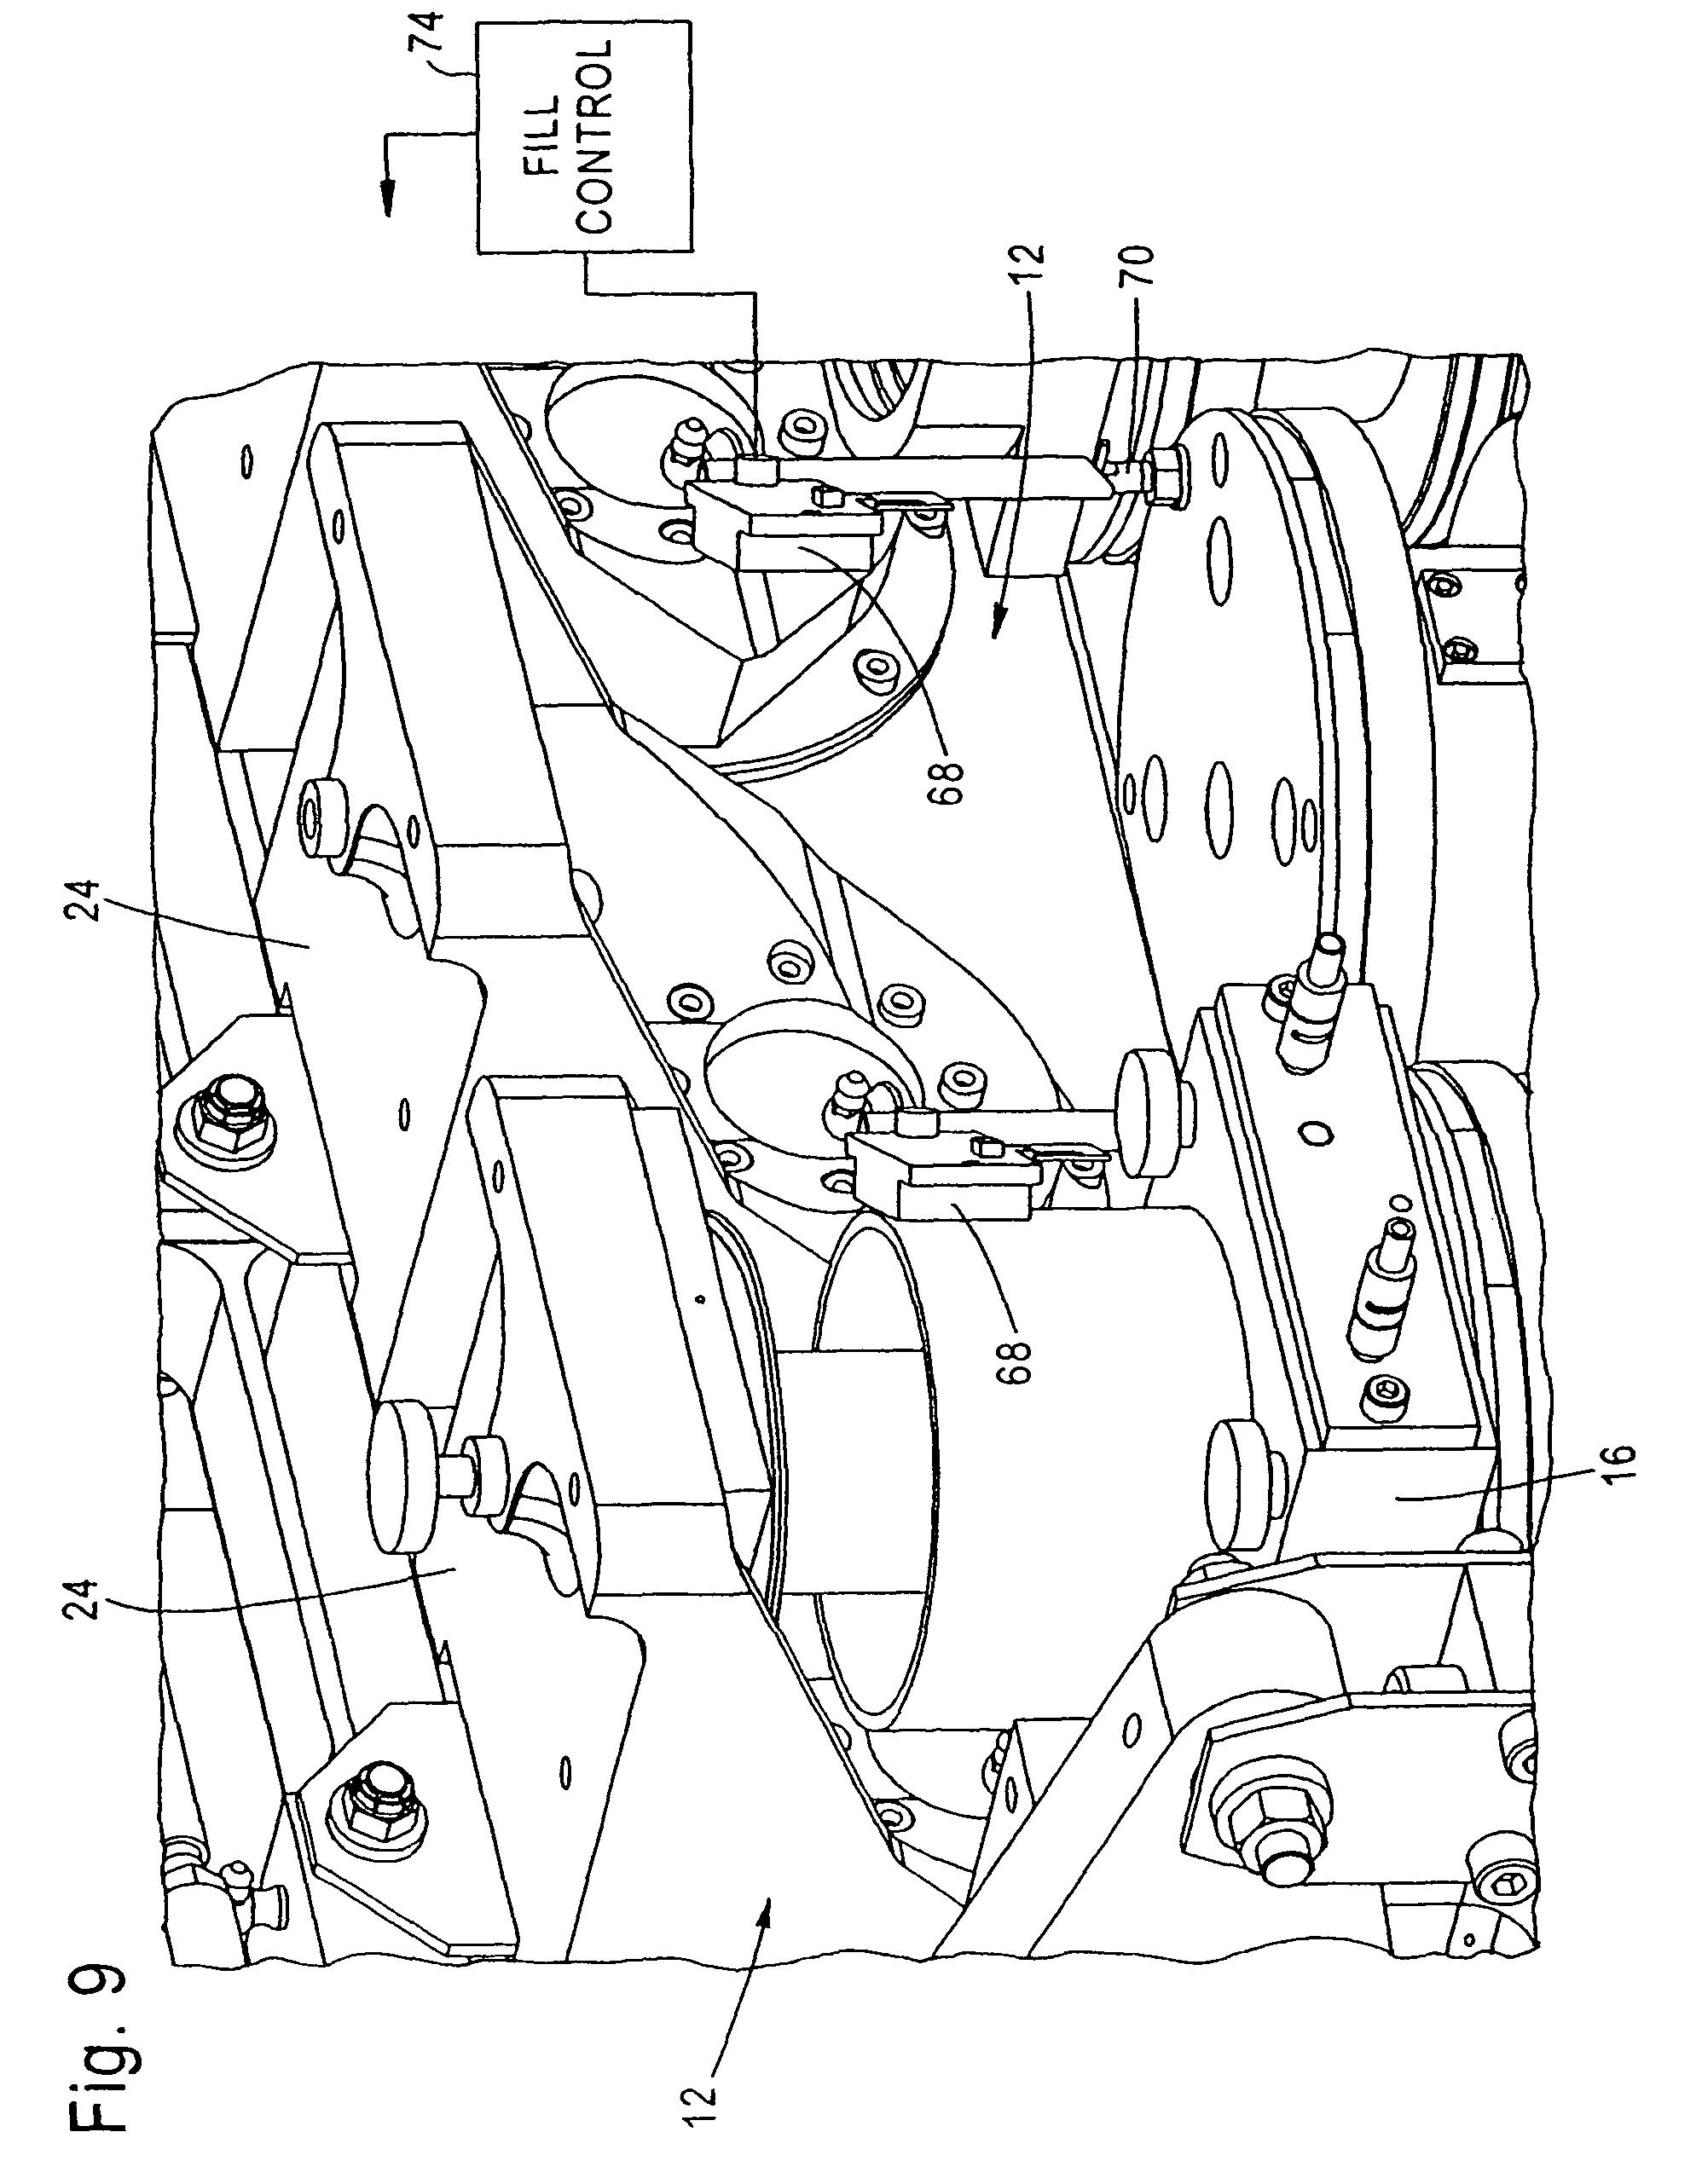 patent us8156824 mechanism arrangement for orthopedic simulator  patent drawing